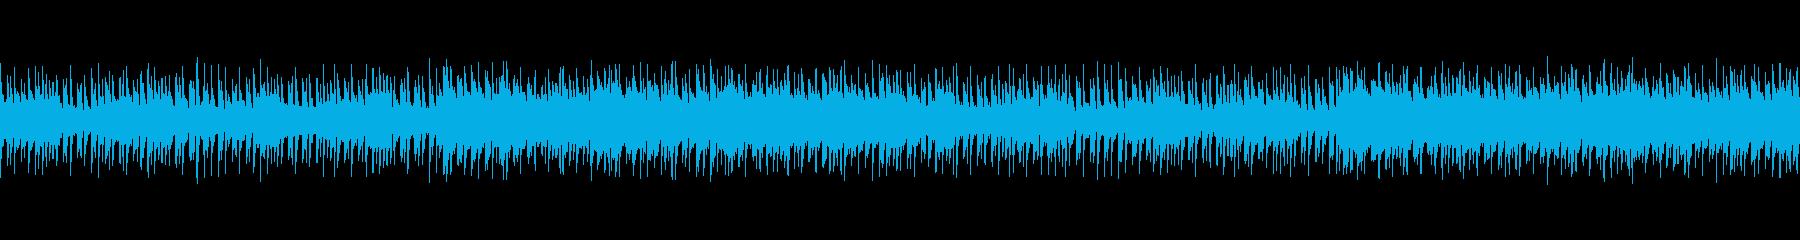 8bitPCアクションRPGタイトルの再生済みの波形